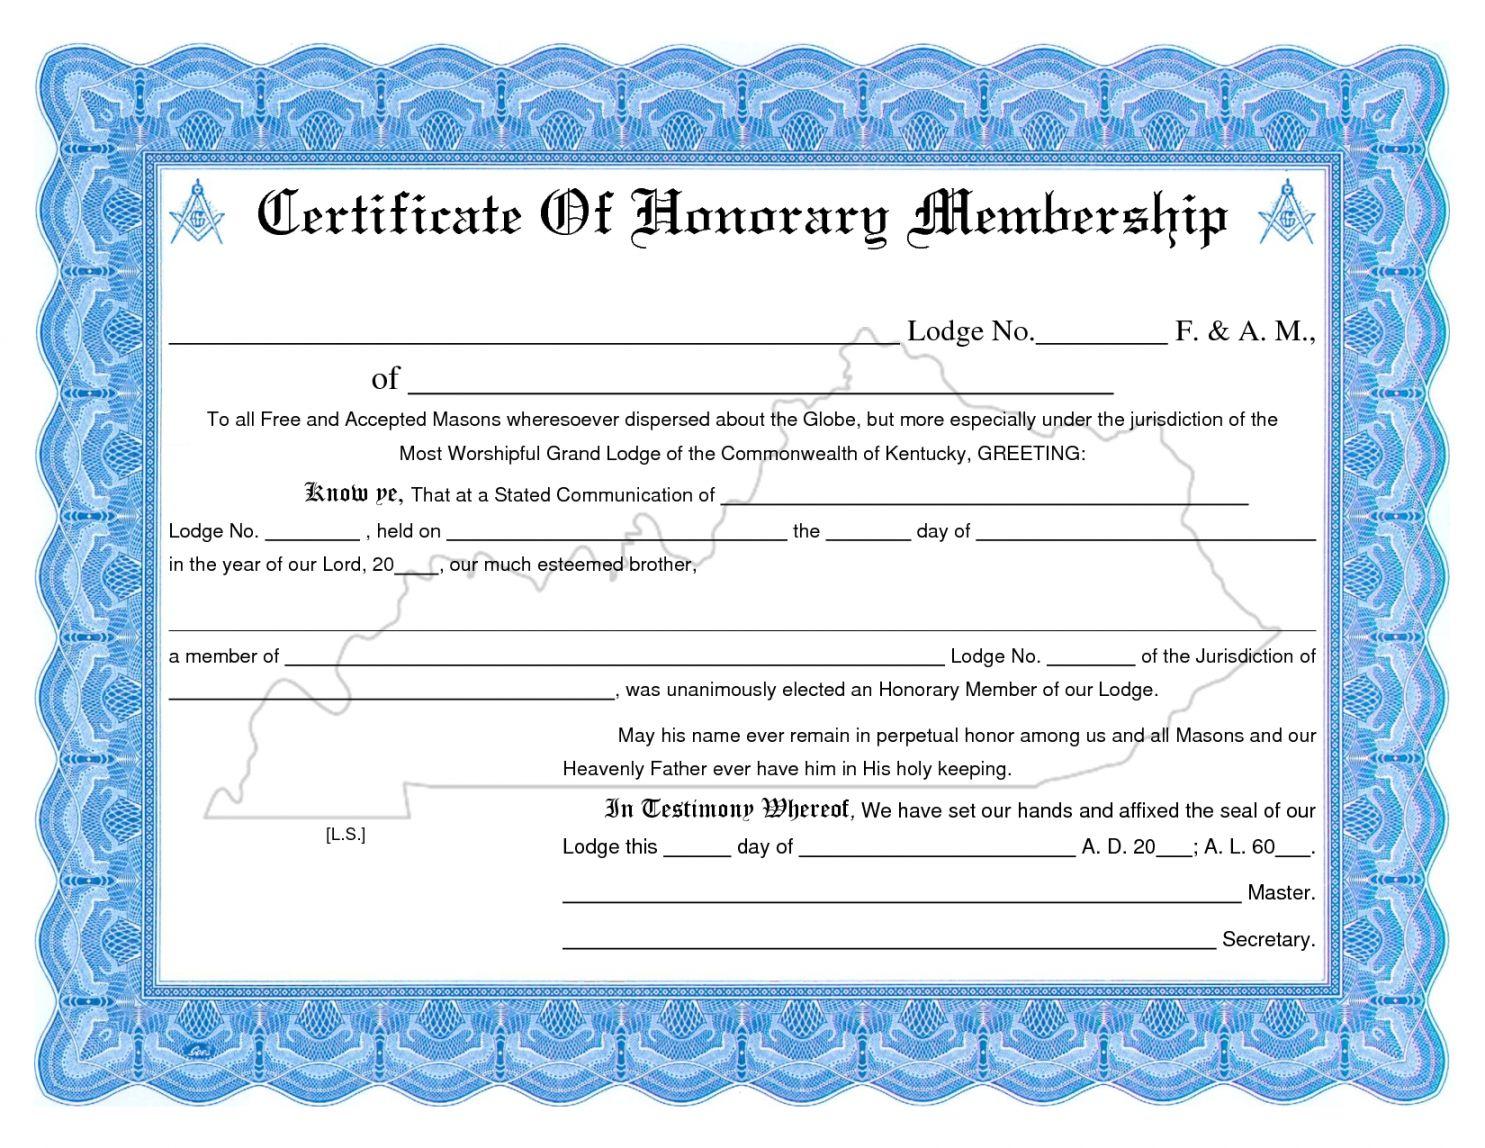 Editable Membership Certificate Template Llc New Church For Llc Membership Certifica Certificate Templates Free Certificate Templates Gift Certificate Template Llc membership certificate template word